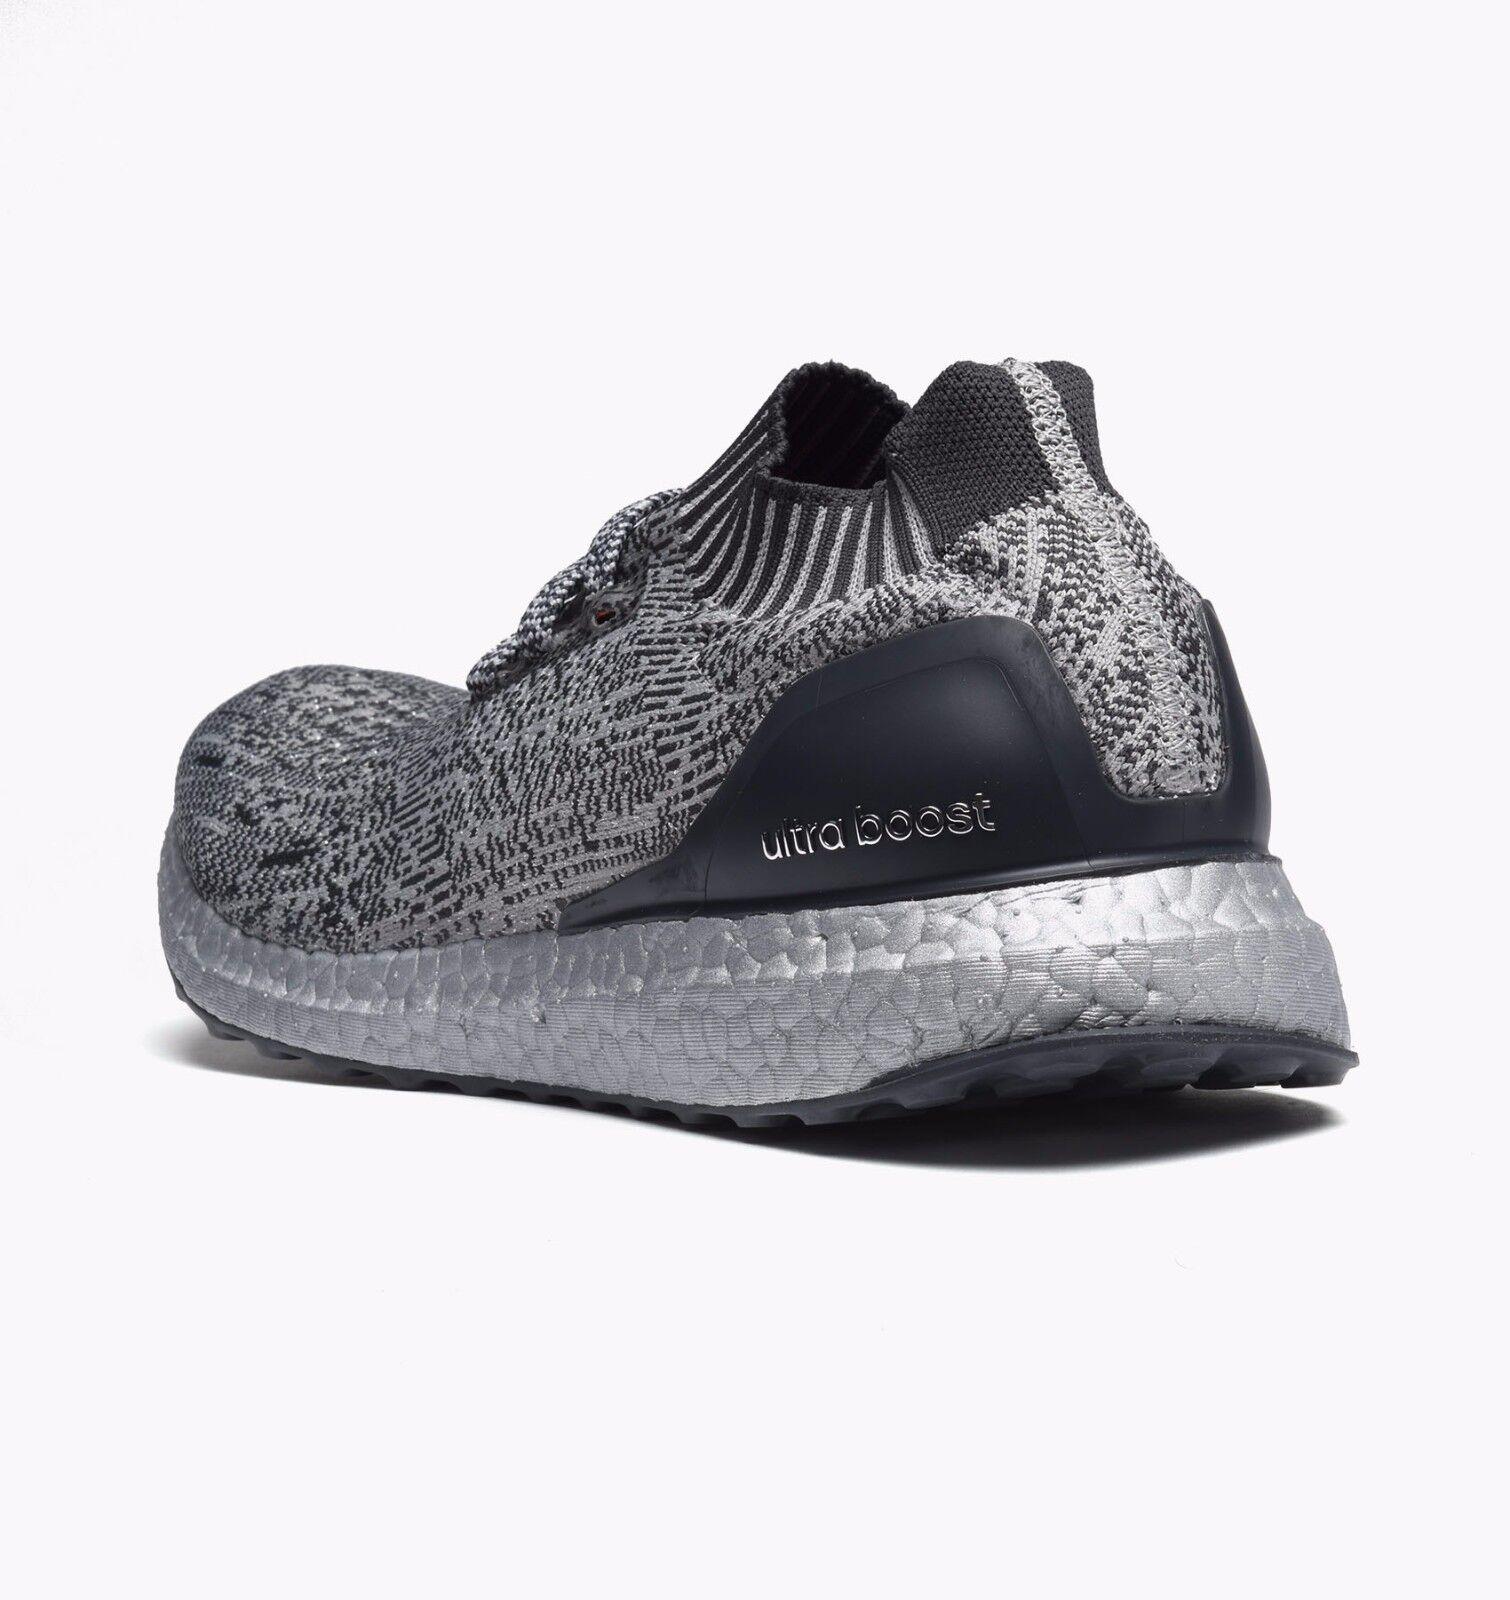 Adidas ultra impulso senza silver freni 3,0 silver senza sz 12,5.super bowl ltd. ba7997.grey nmd aded8d